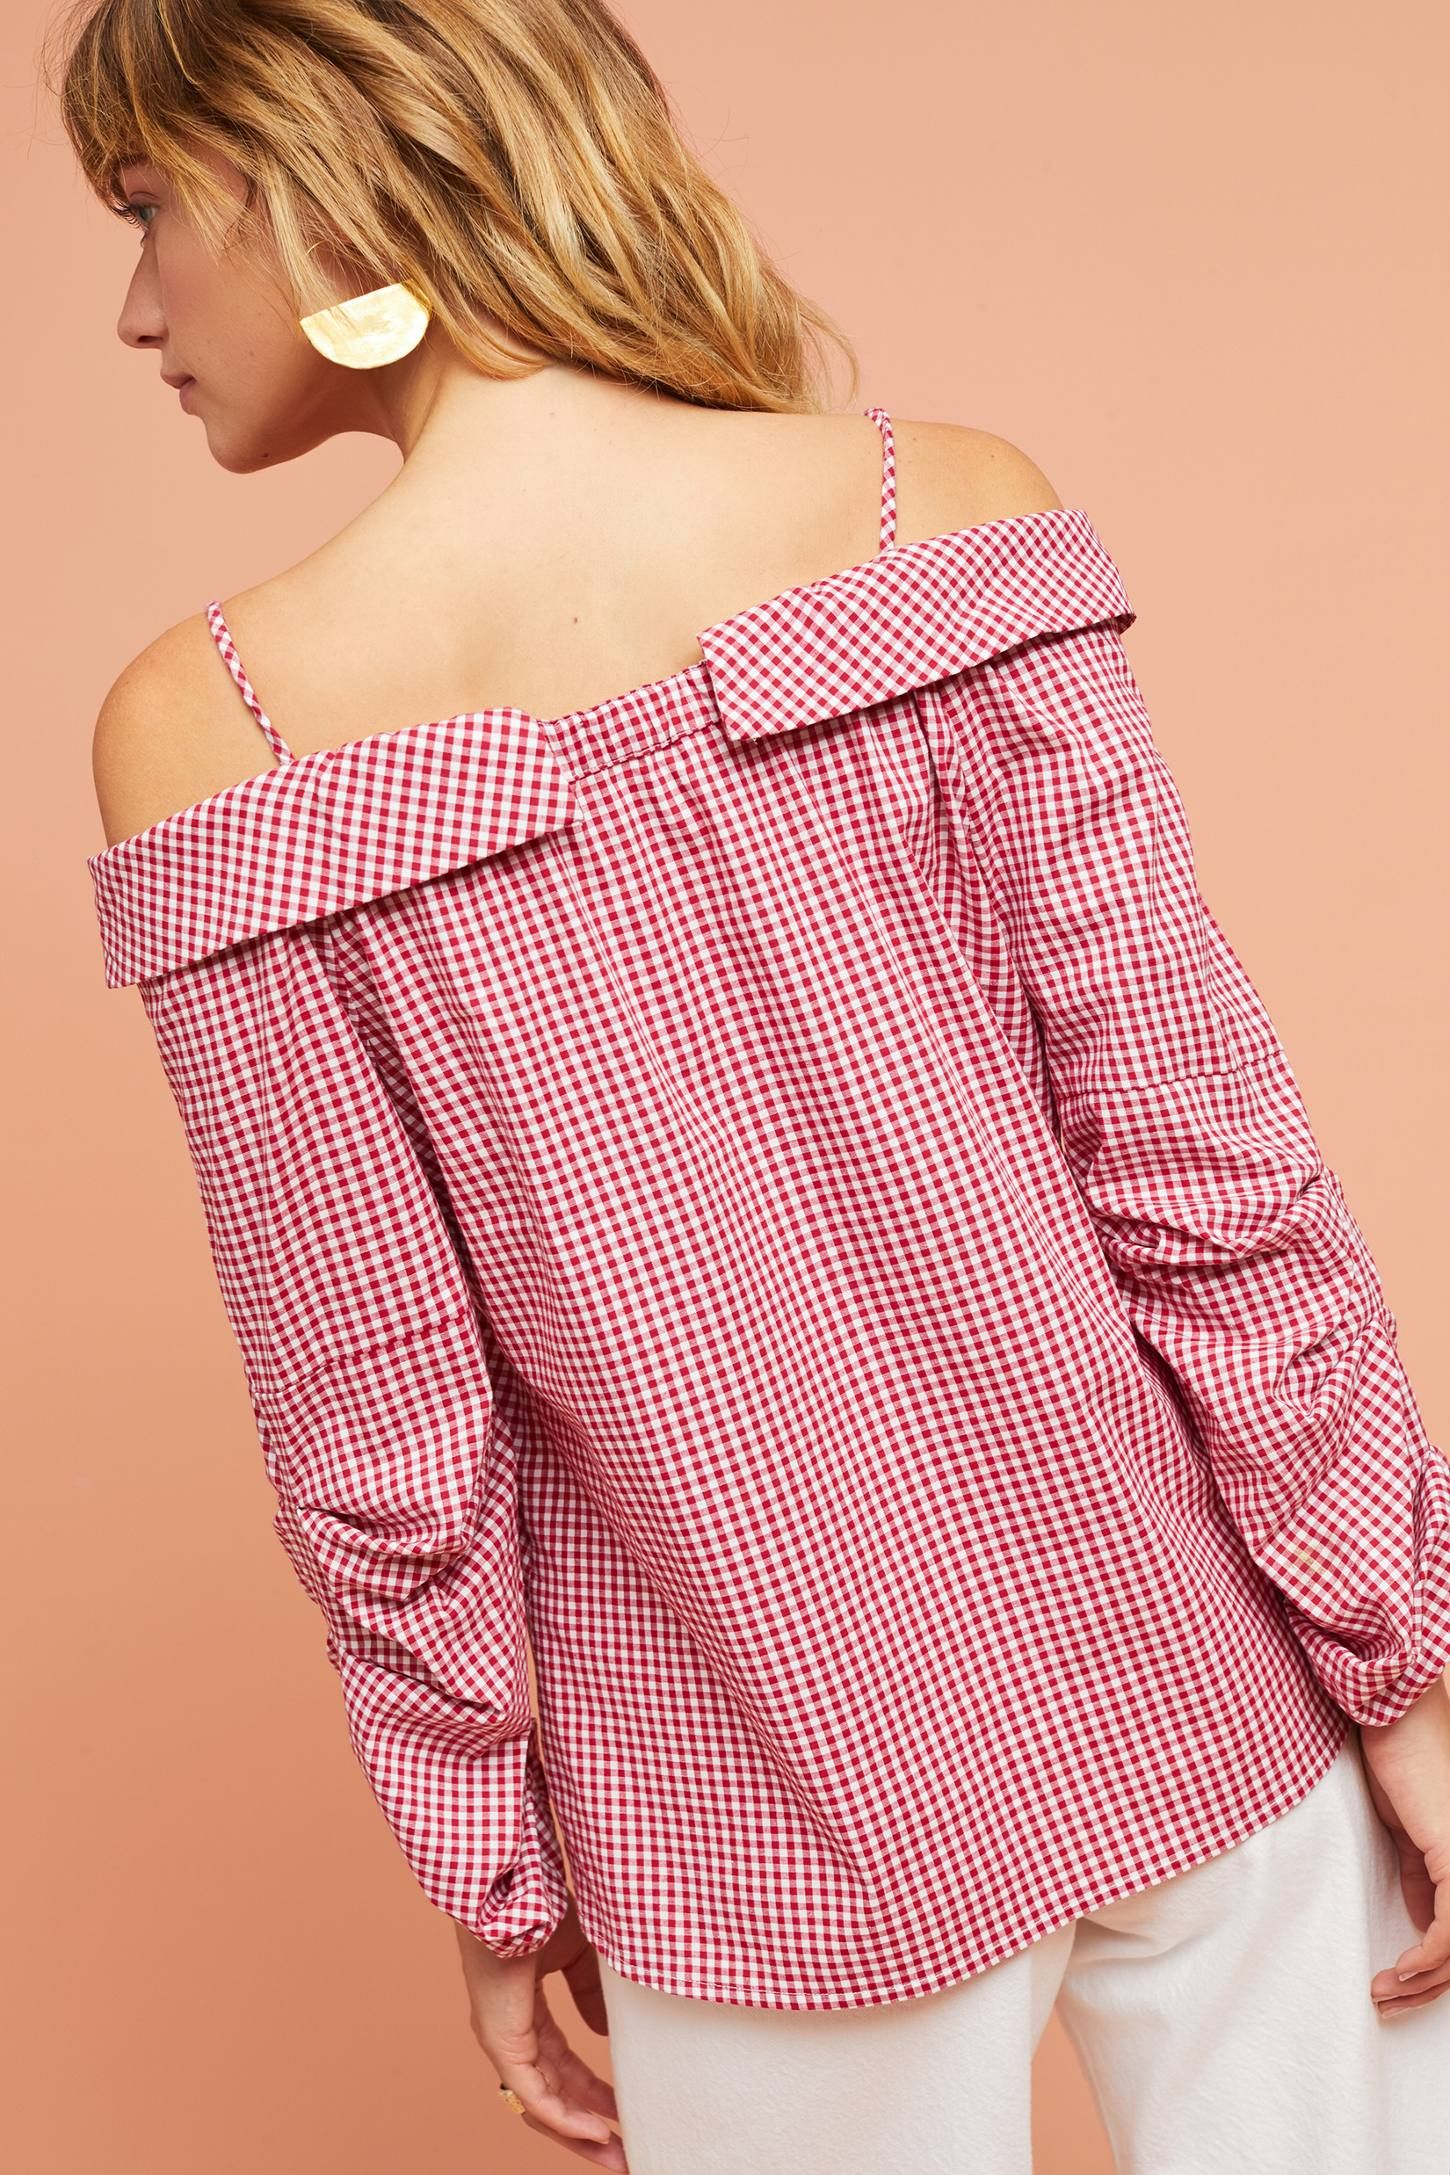 Adalie Open-Shoulder Buttondown | Pinterest | Shoulder and Anthropologie